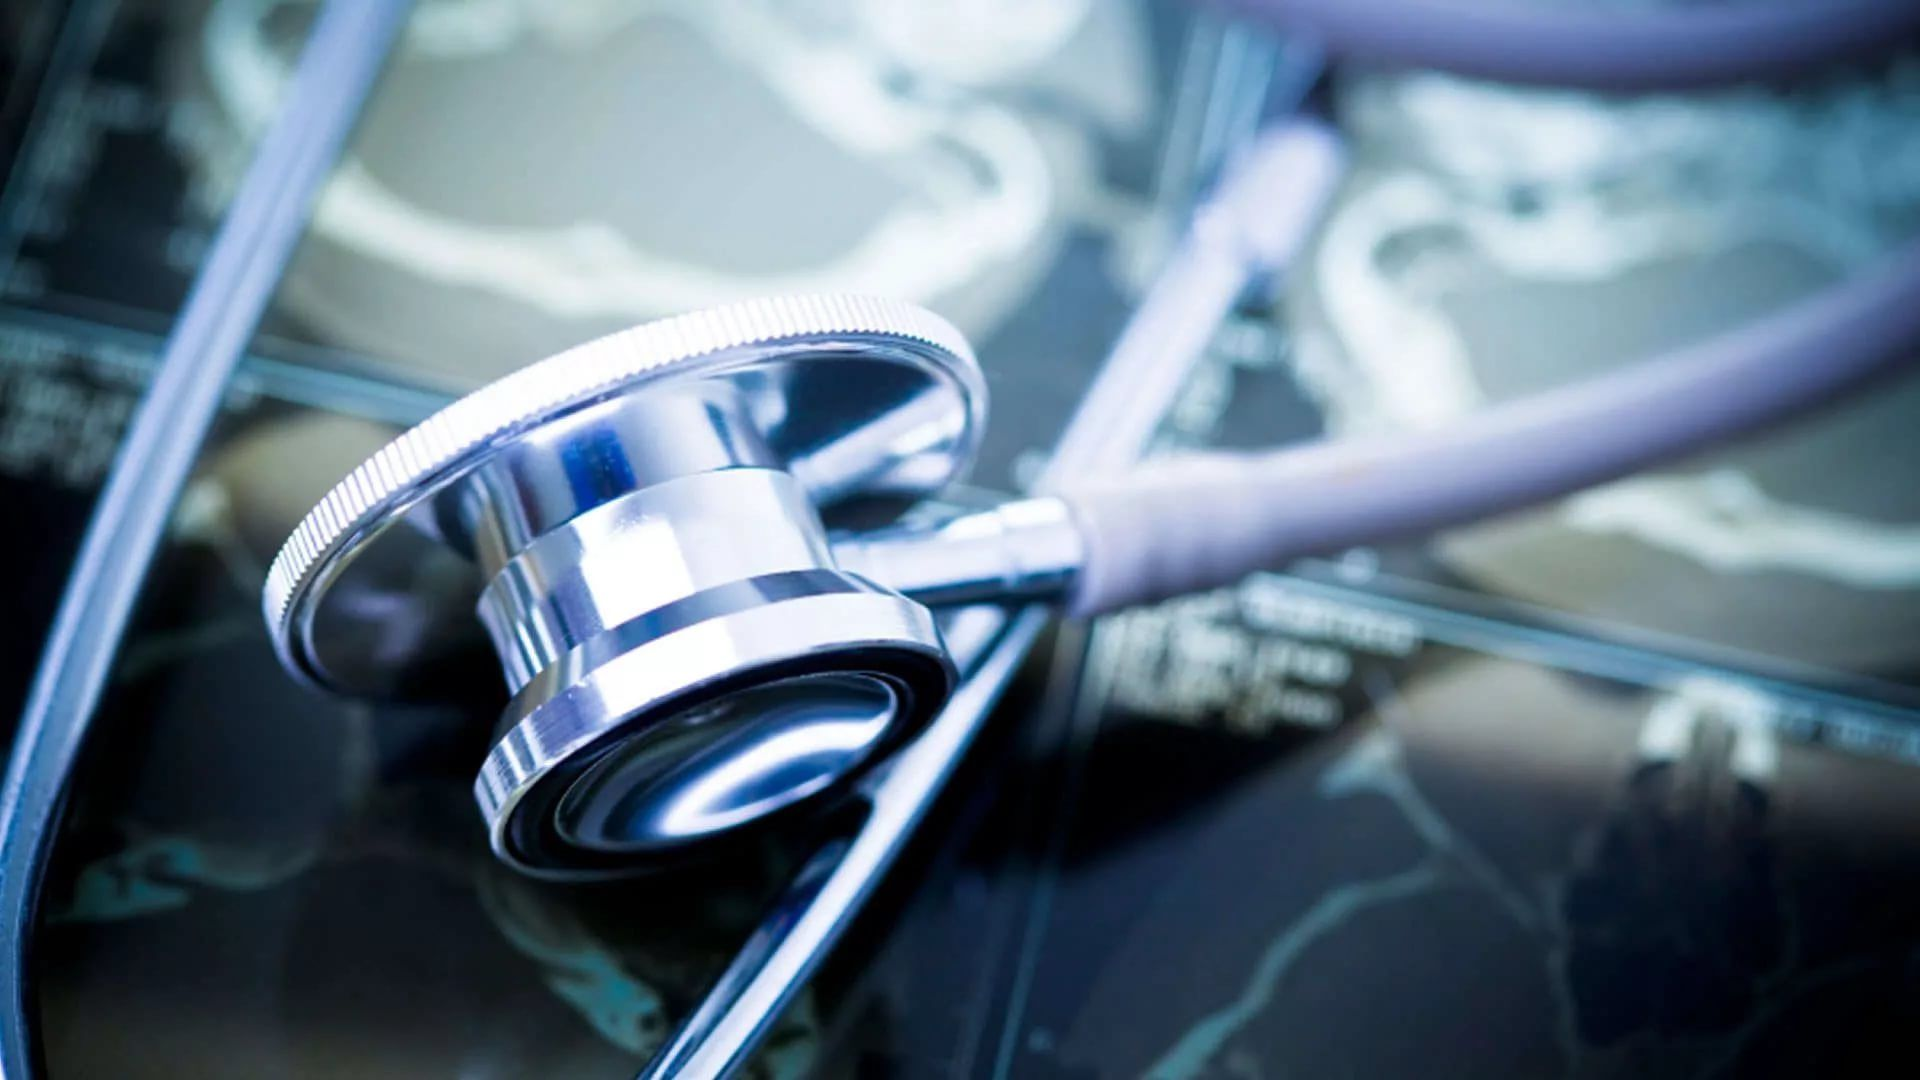 Medical Wallpapers 24 Images Wallpaperboat